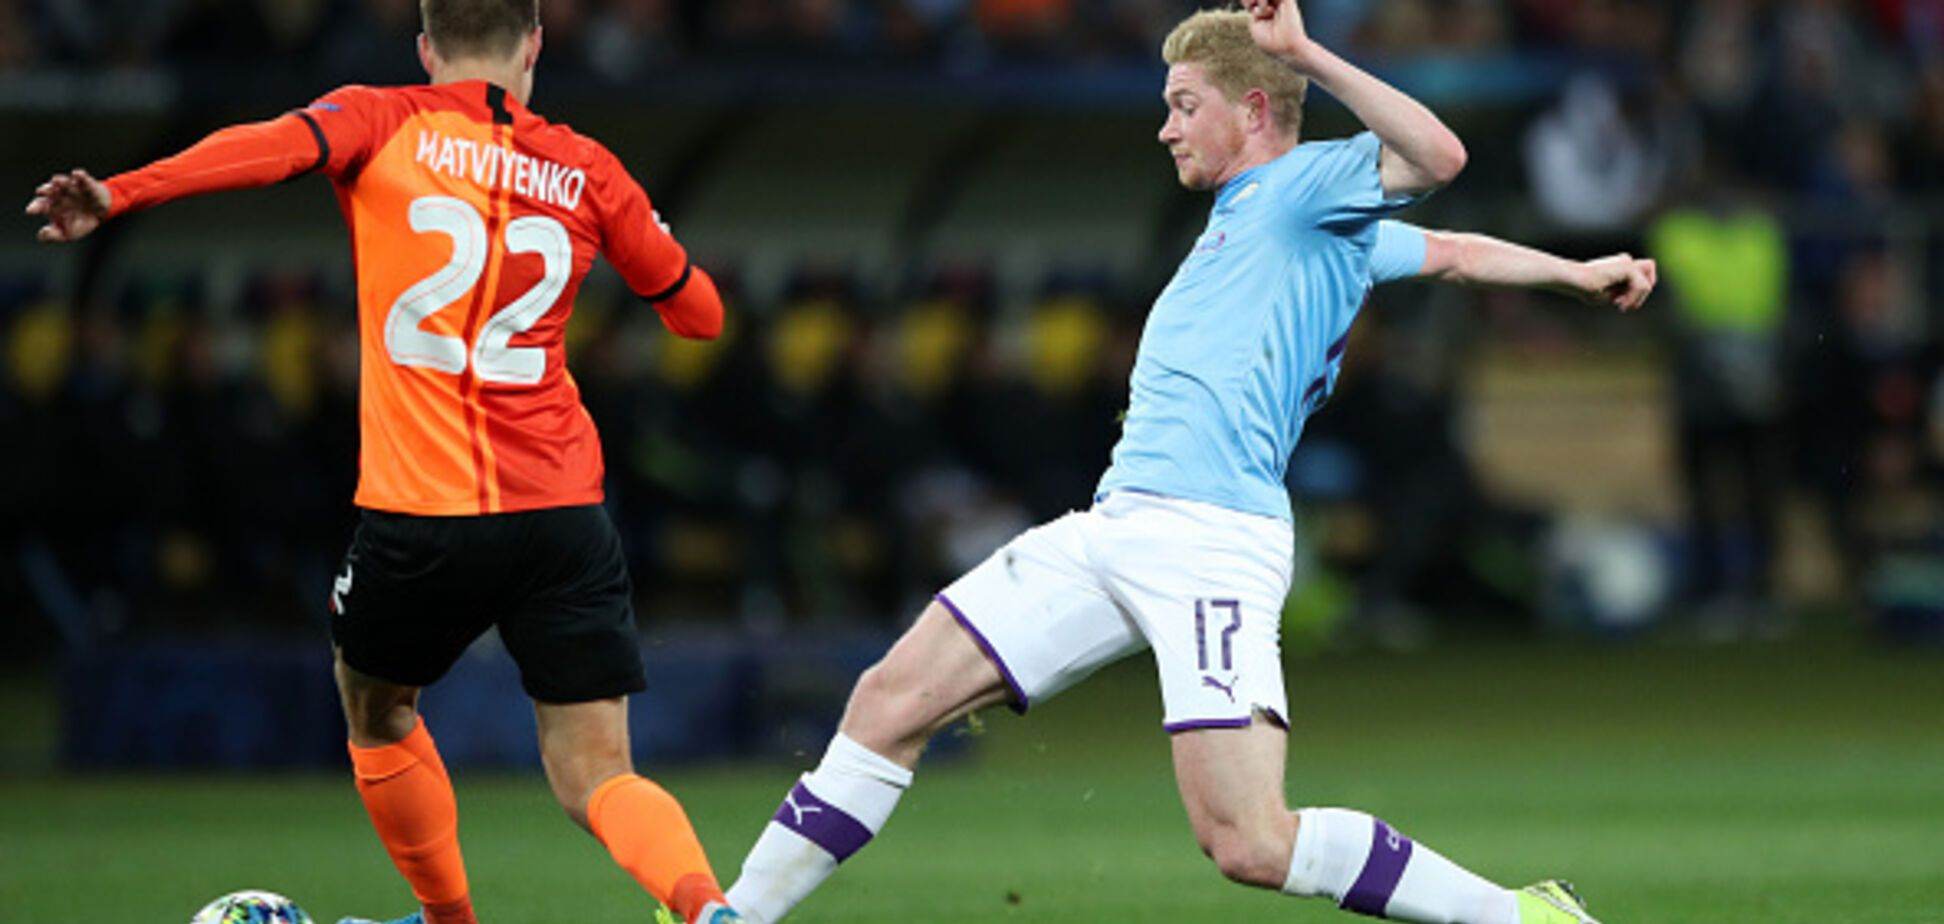 'Шахтер' - 'Манчестер Сити': видеообзор матча Лиги чемпионов